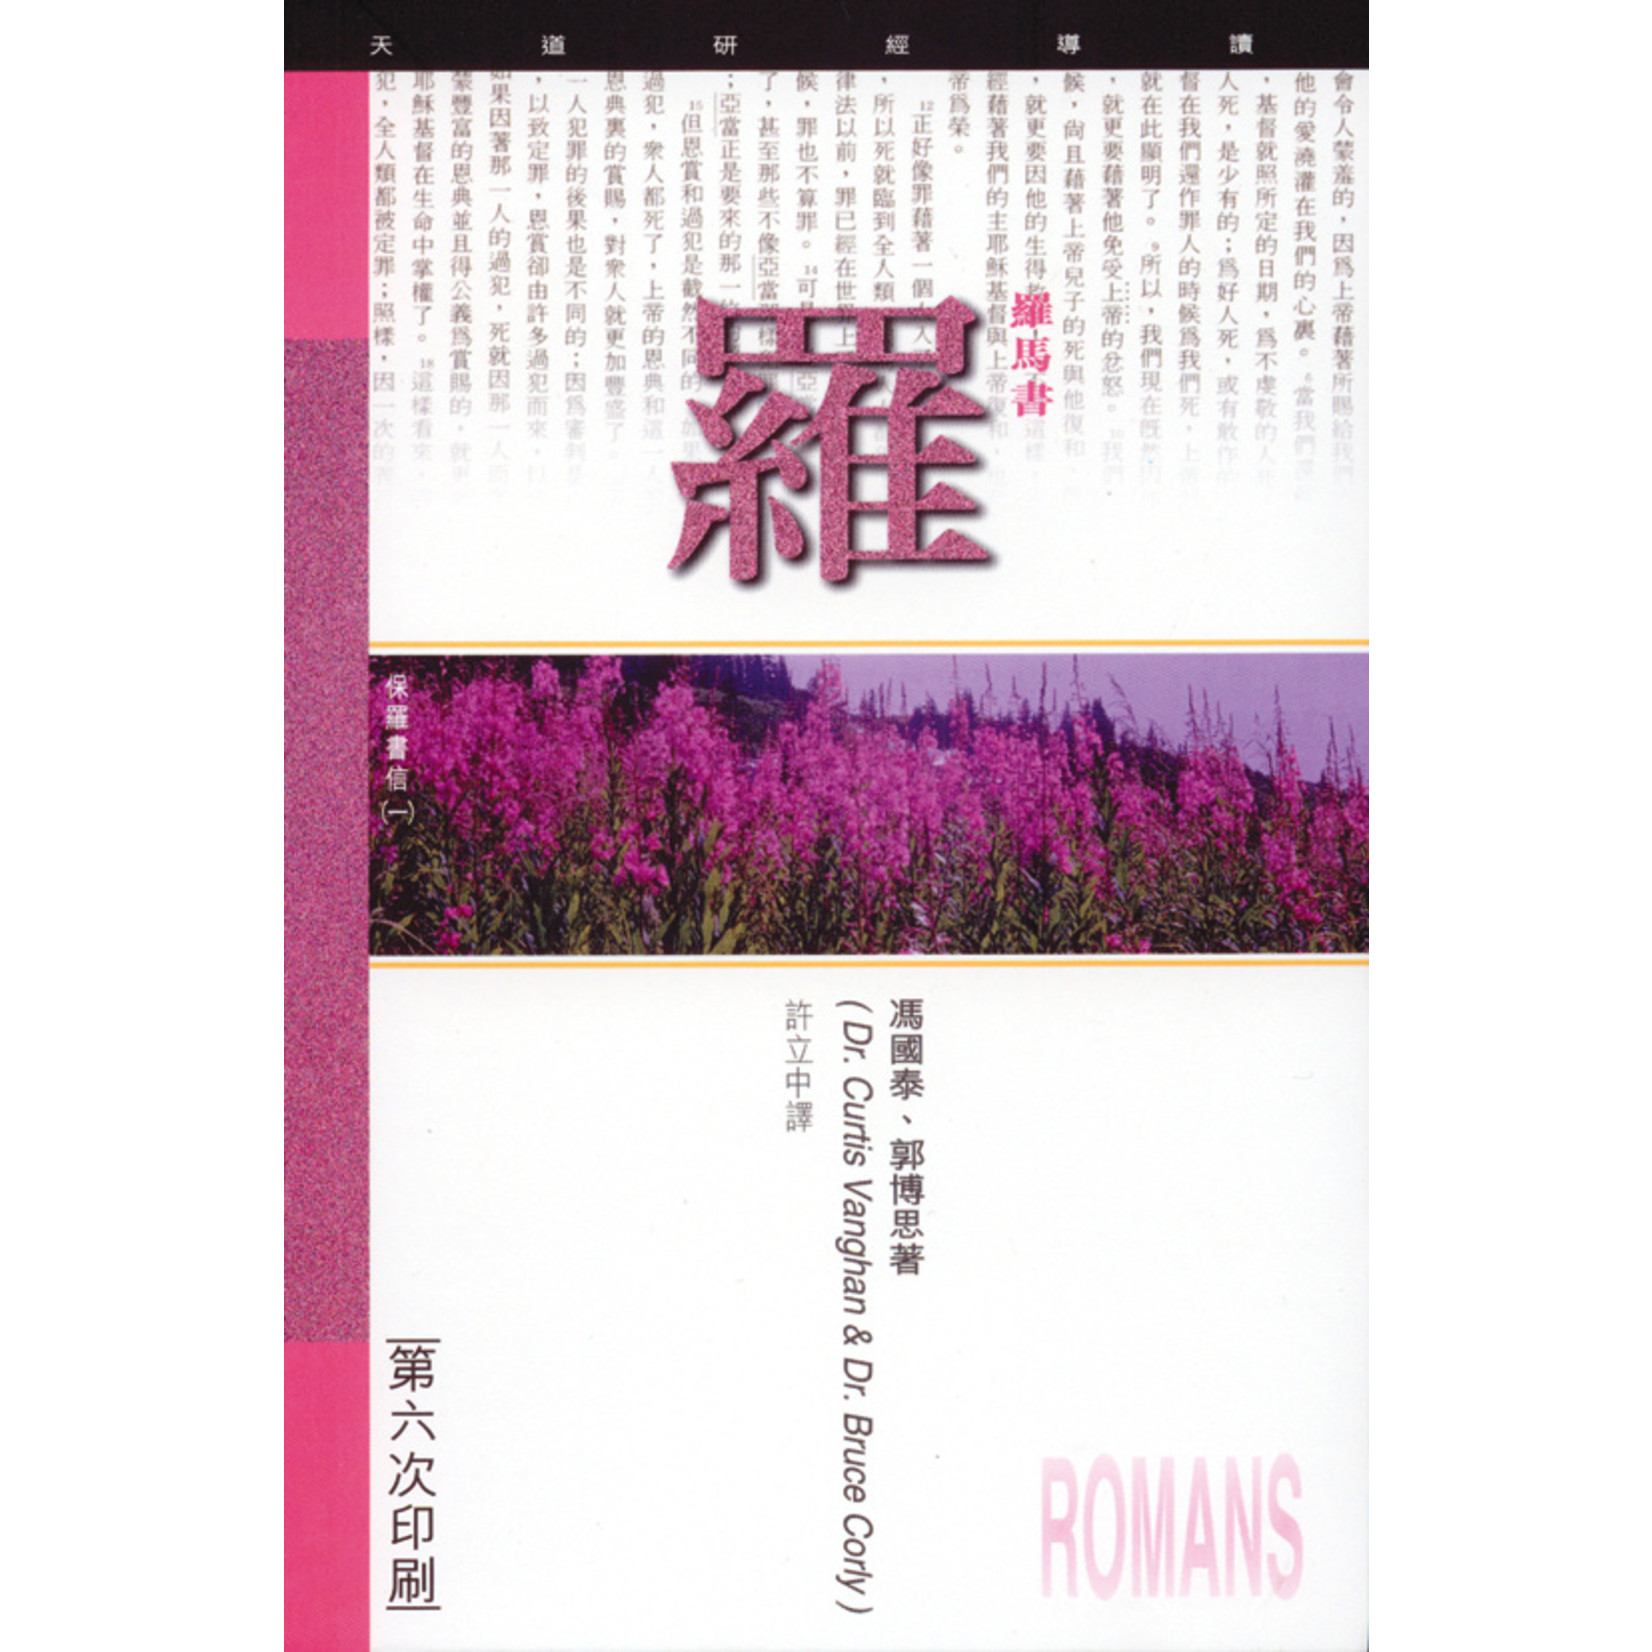 天道書樓 Tien Dao Publishing House 天道研經導讀:羅馬書